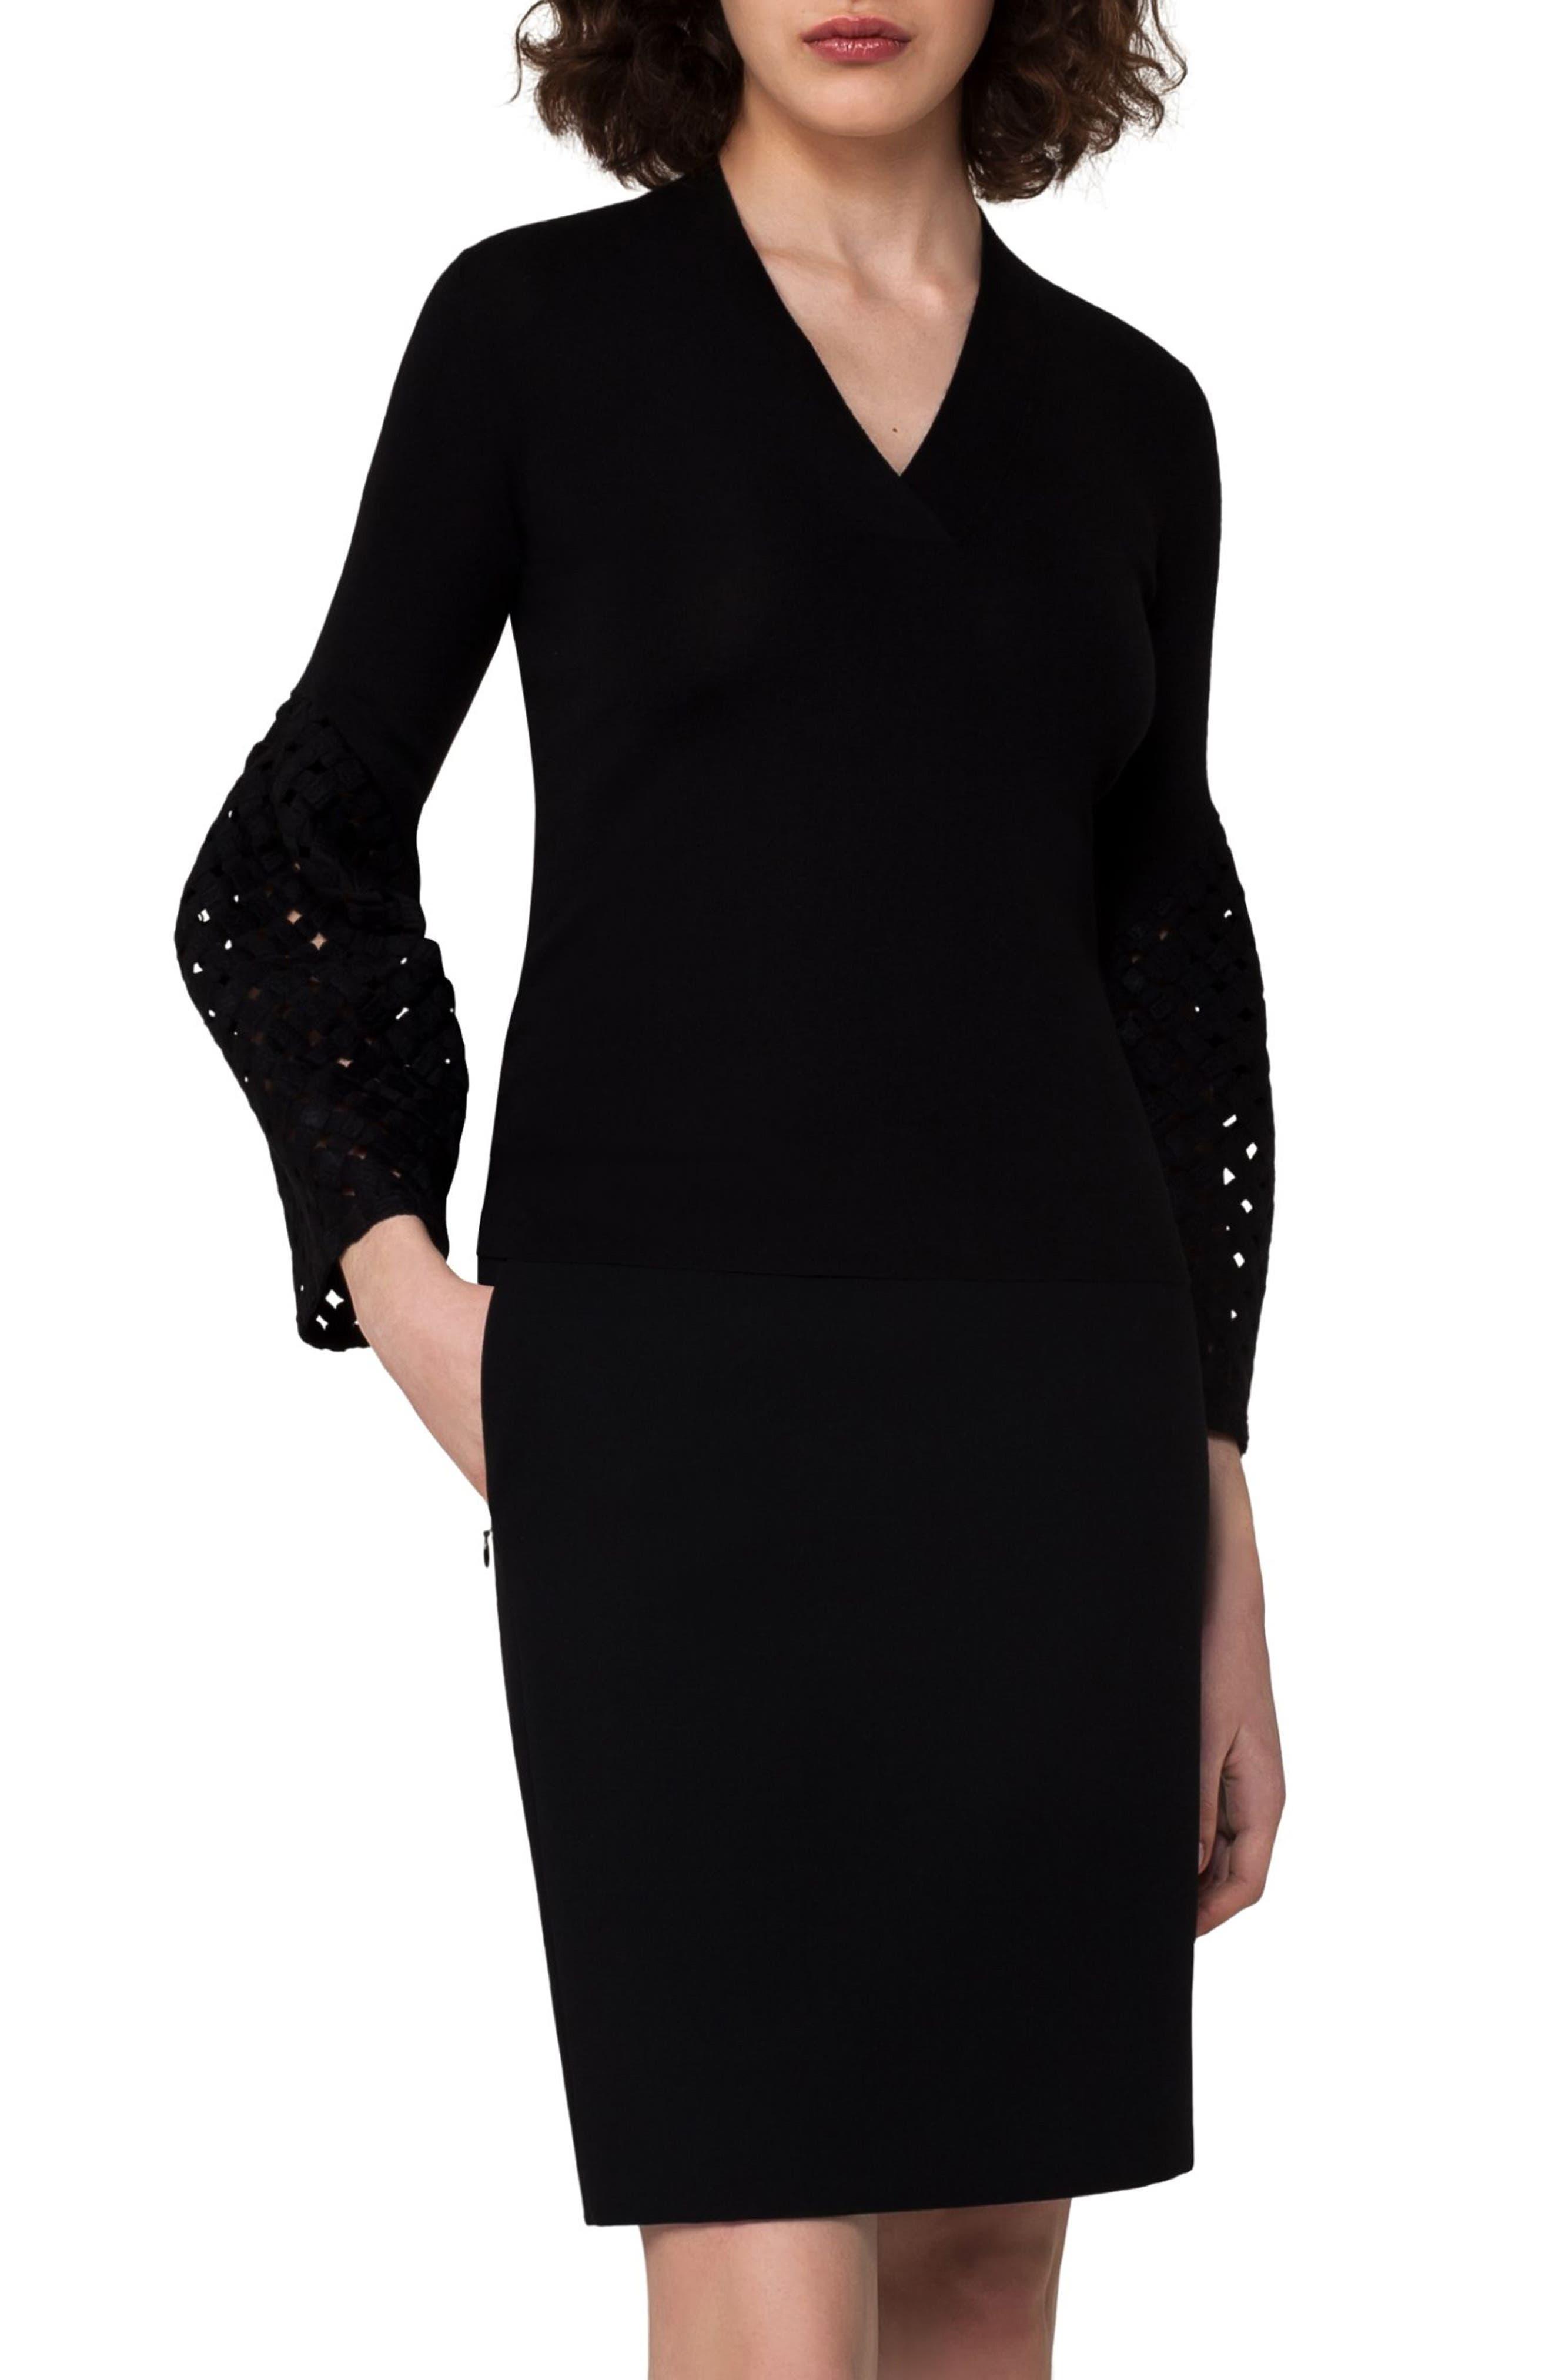 Lace Sleeve Cashmere & Silk Sweater,                         Main,                         color, Black